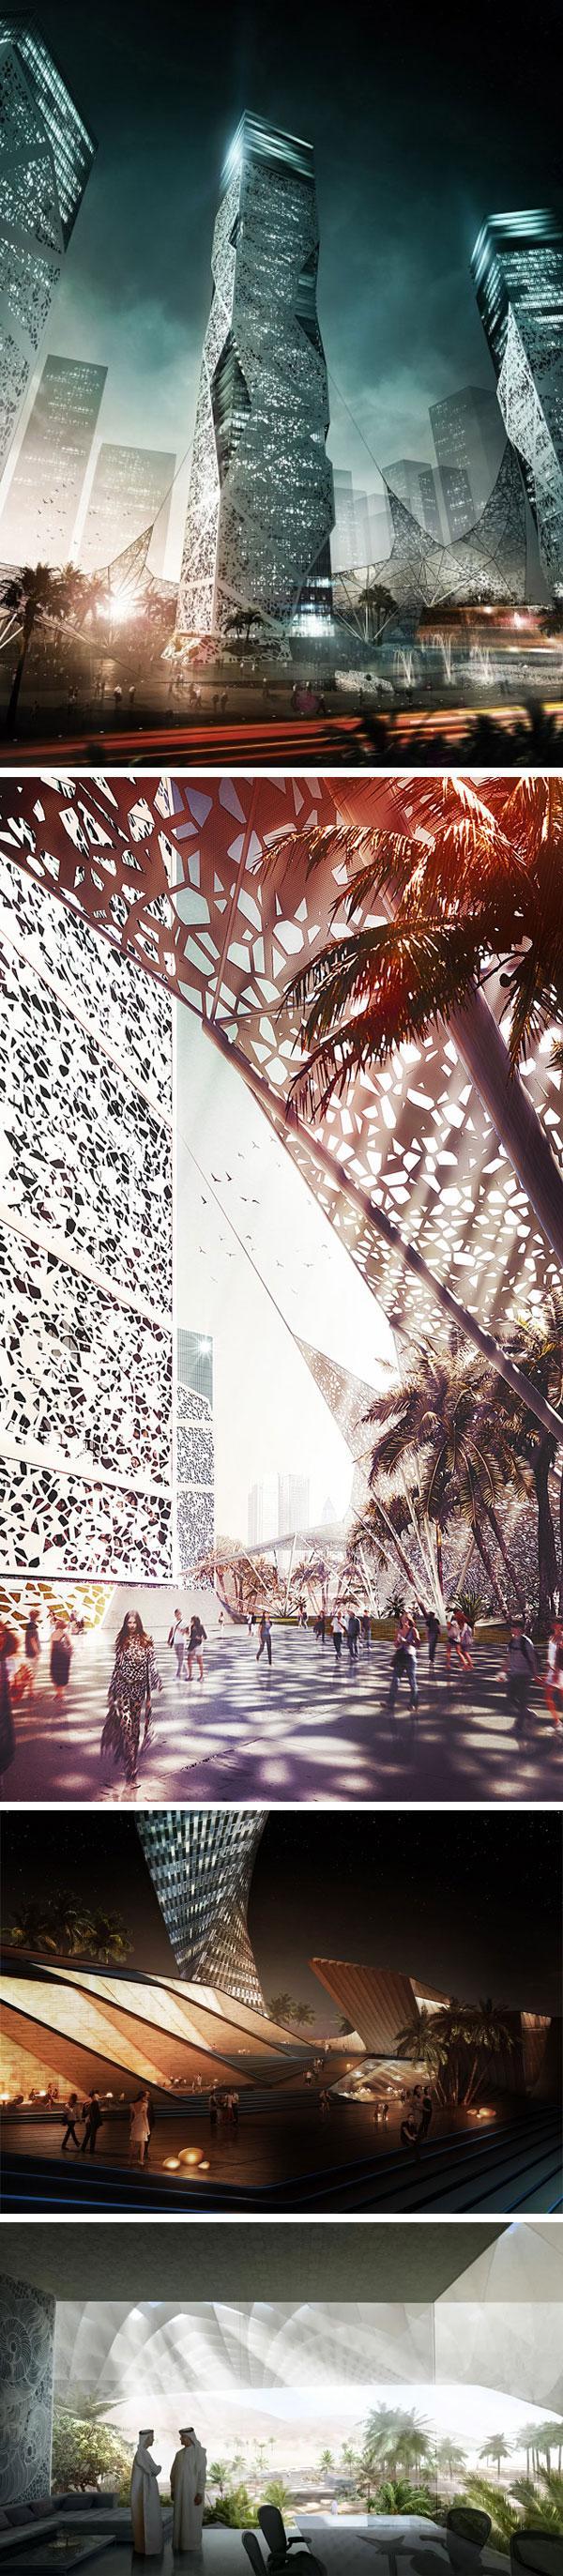 nicolas richelet | MRG LAB BLOG creative experience